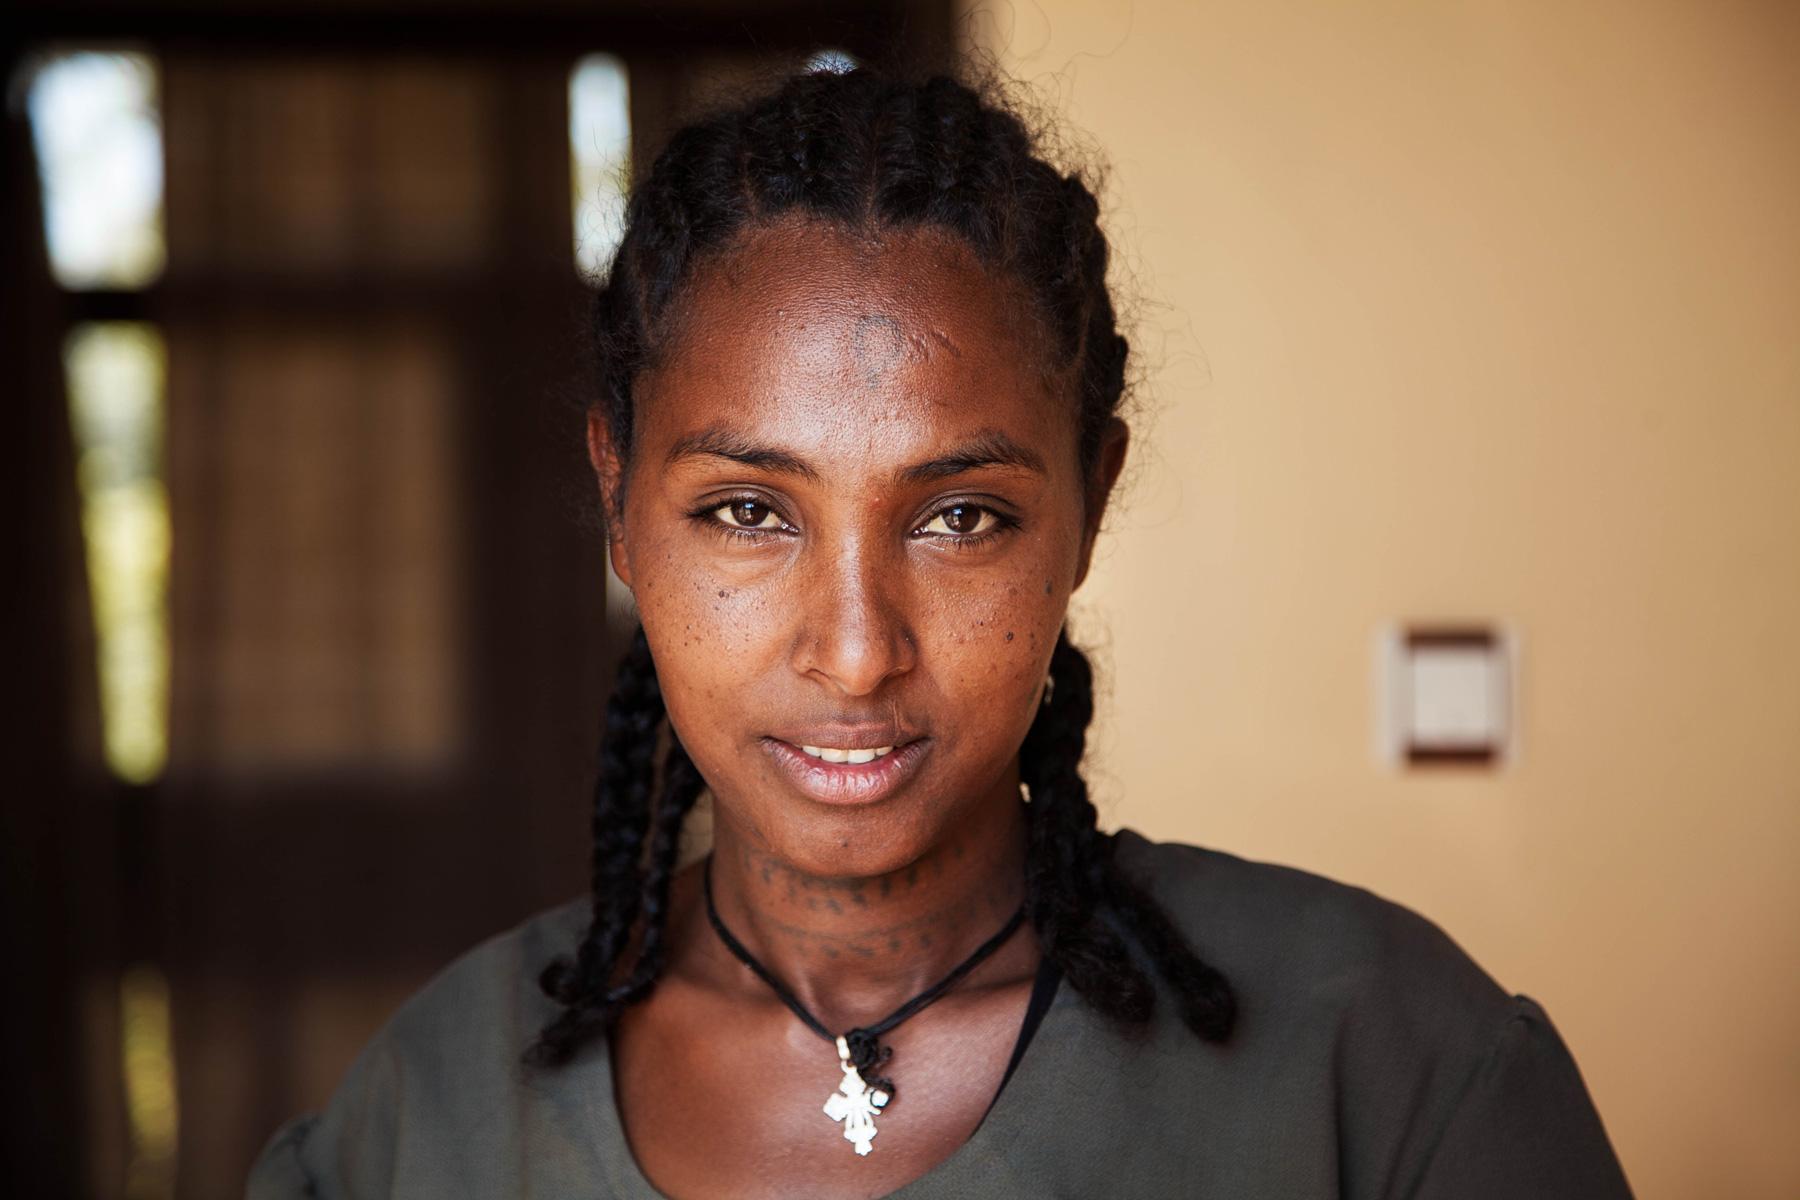 Mihaela-Noroc-Atlas-of-Beauty-Ethiopia